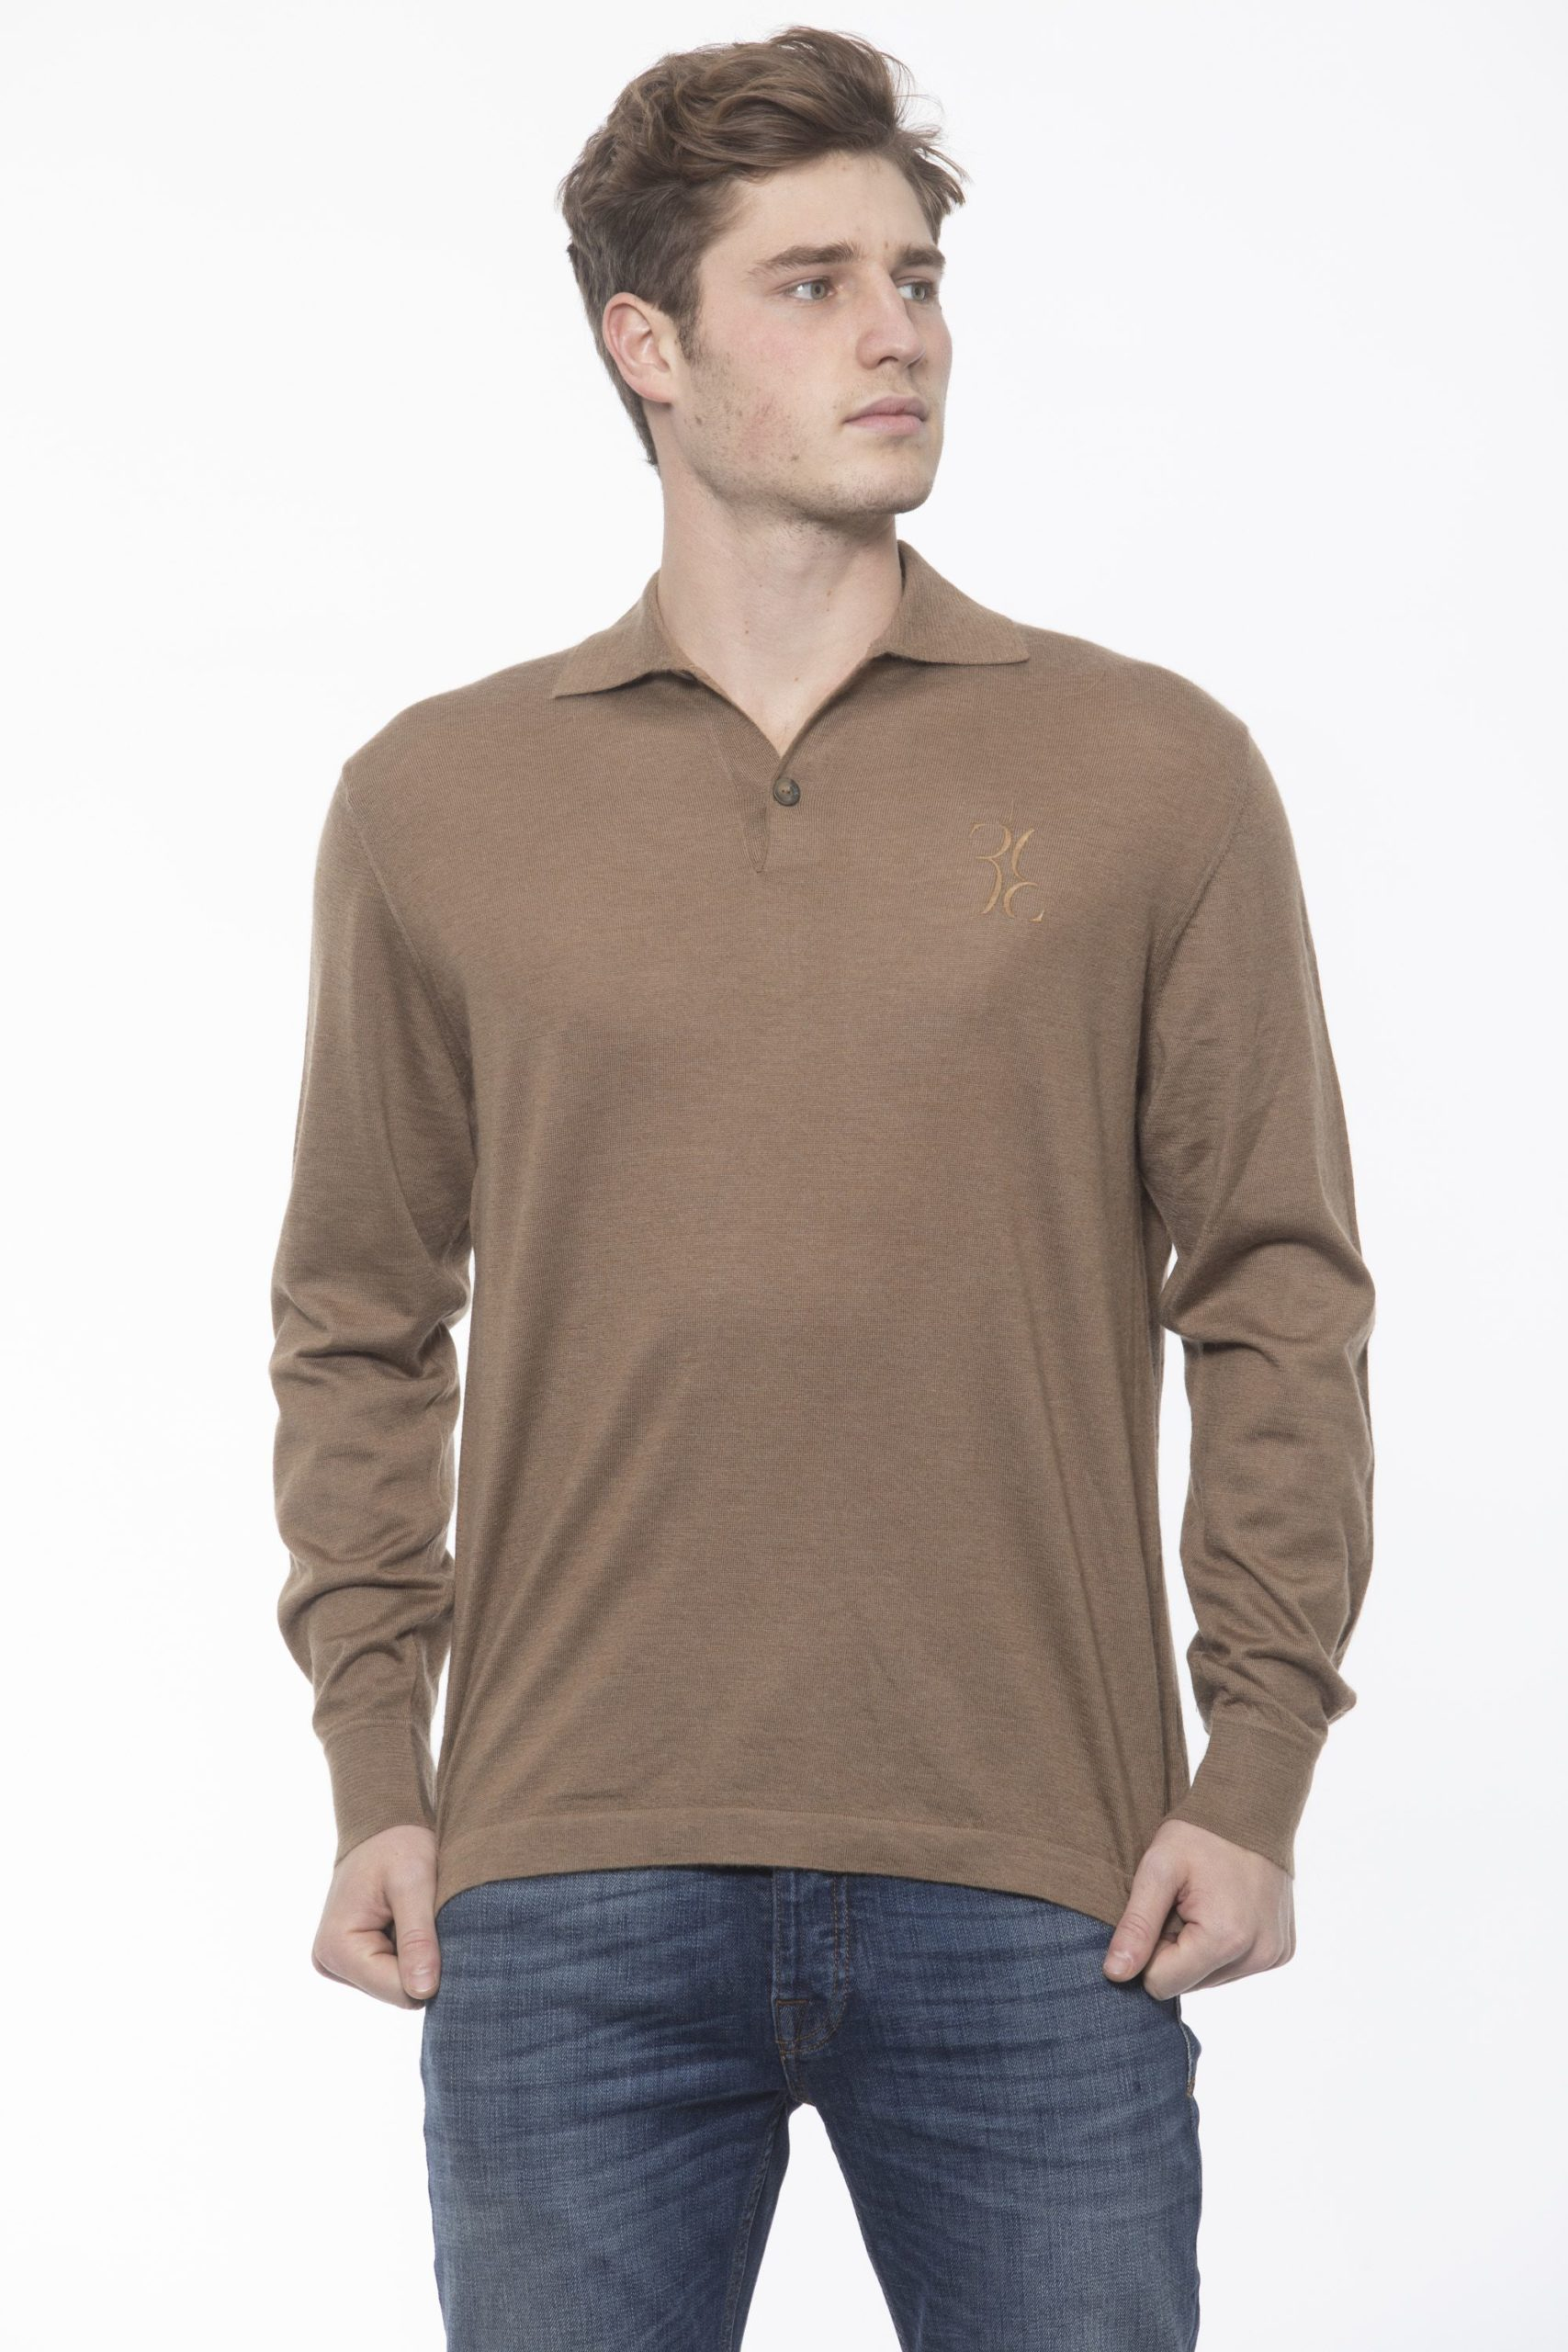 Billionaire Italian Couture Men's Tabacco Polo Shirt Beige BI1313445 - XL